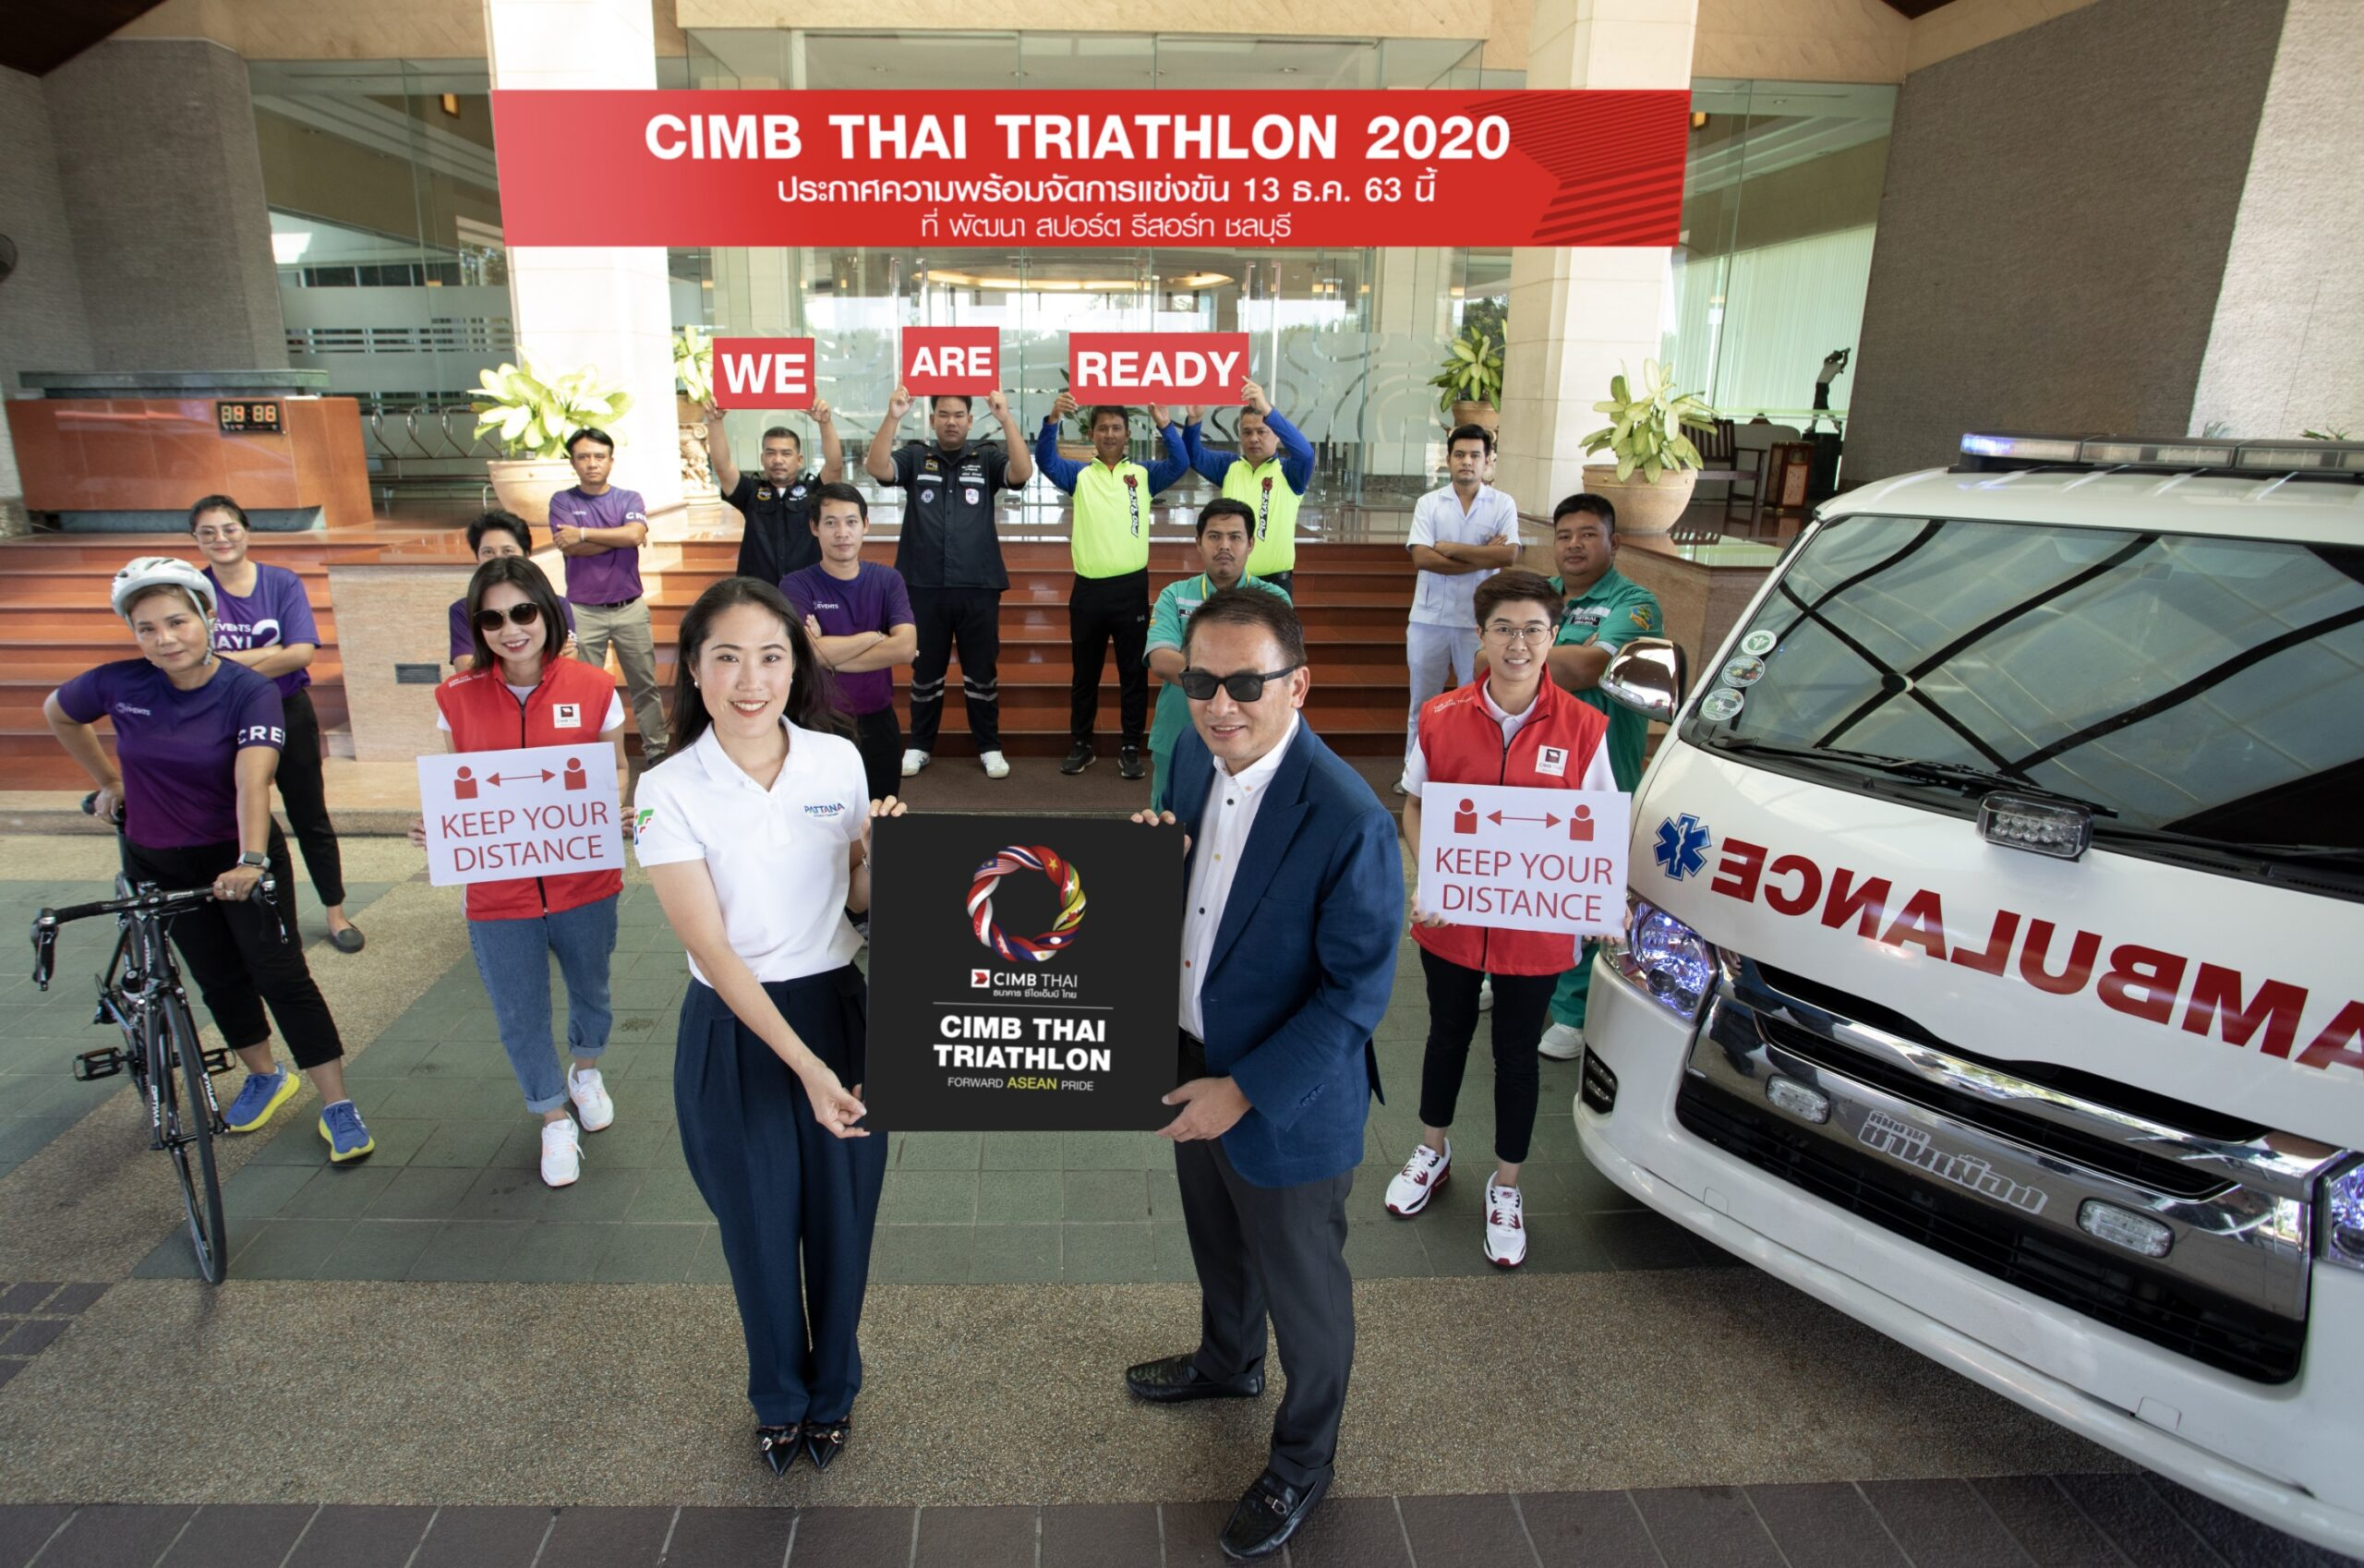 CIMB Thai Triathlon Forward ASEAN Pride 2020 พร้อมลุย